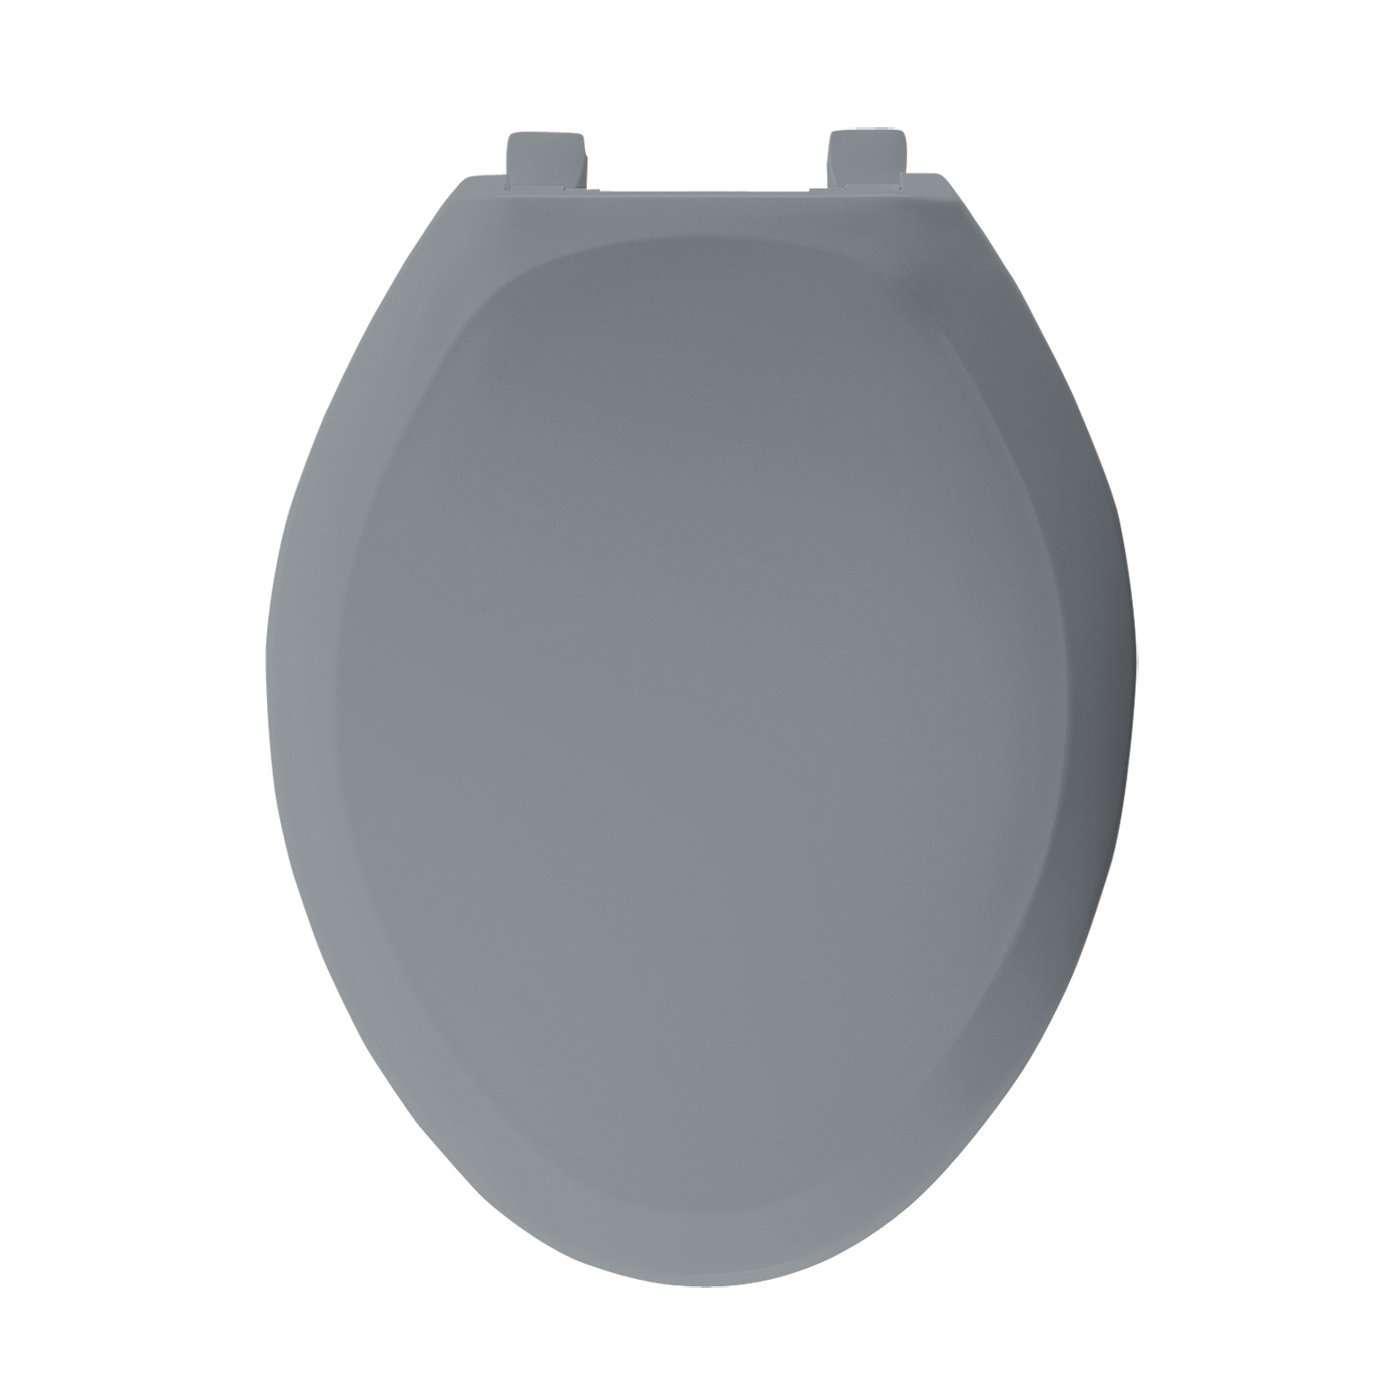 Church Bemis 1200tc032 Plastic Elongated Toilet Seat